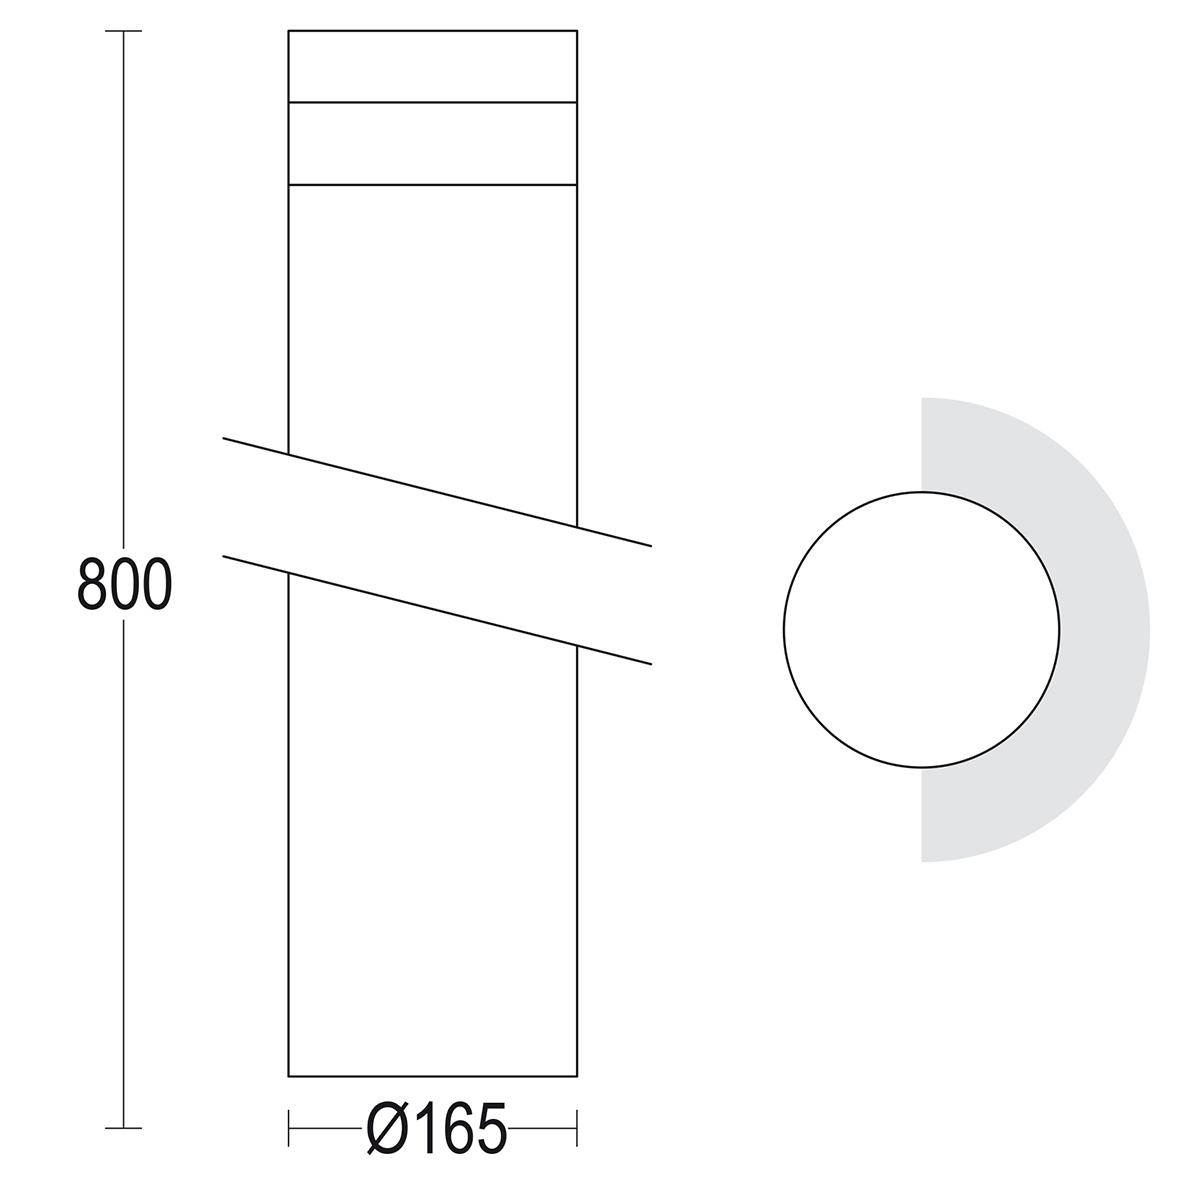 чертеж Maxitondo 800 Ghidini уличный светильник GH1371.FAXT400EN